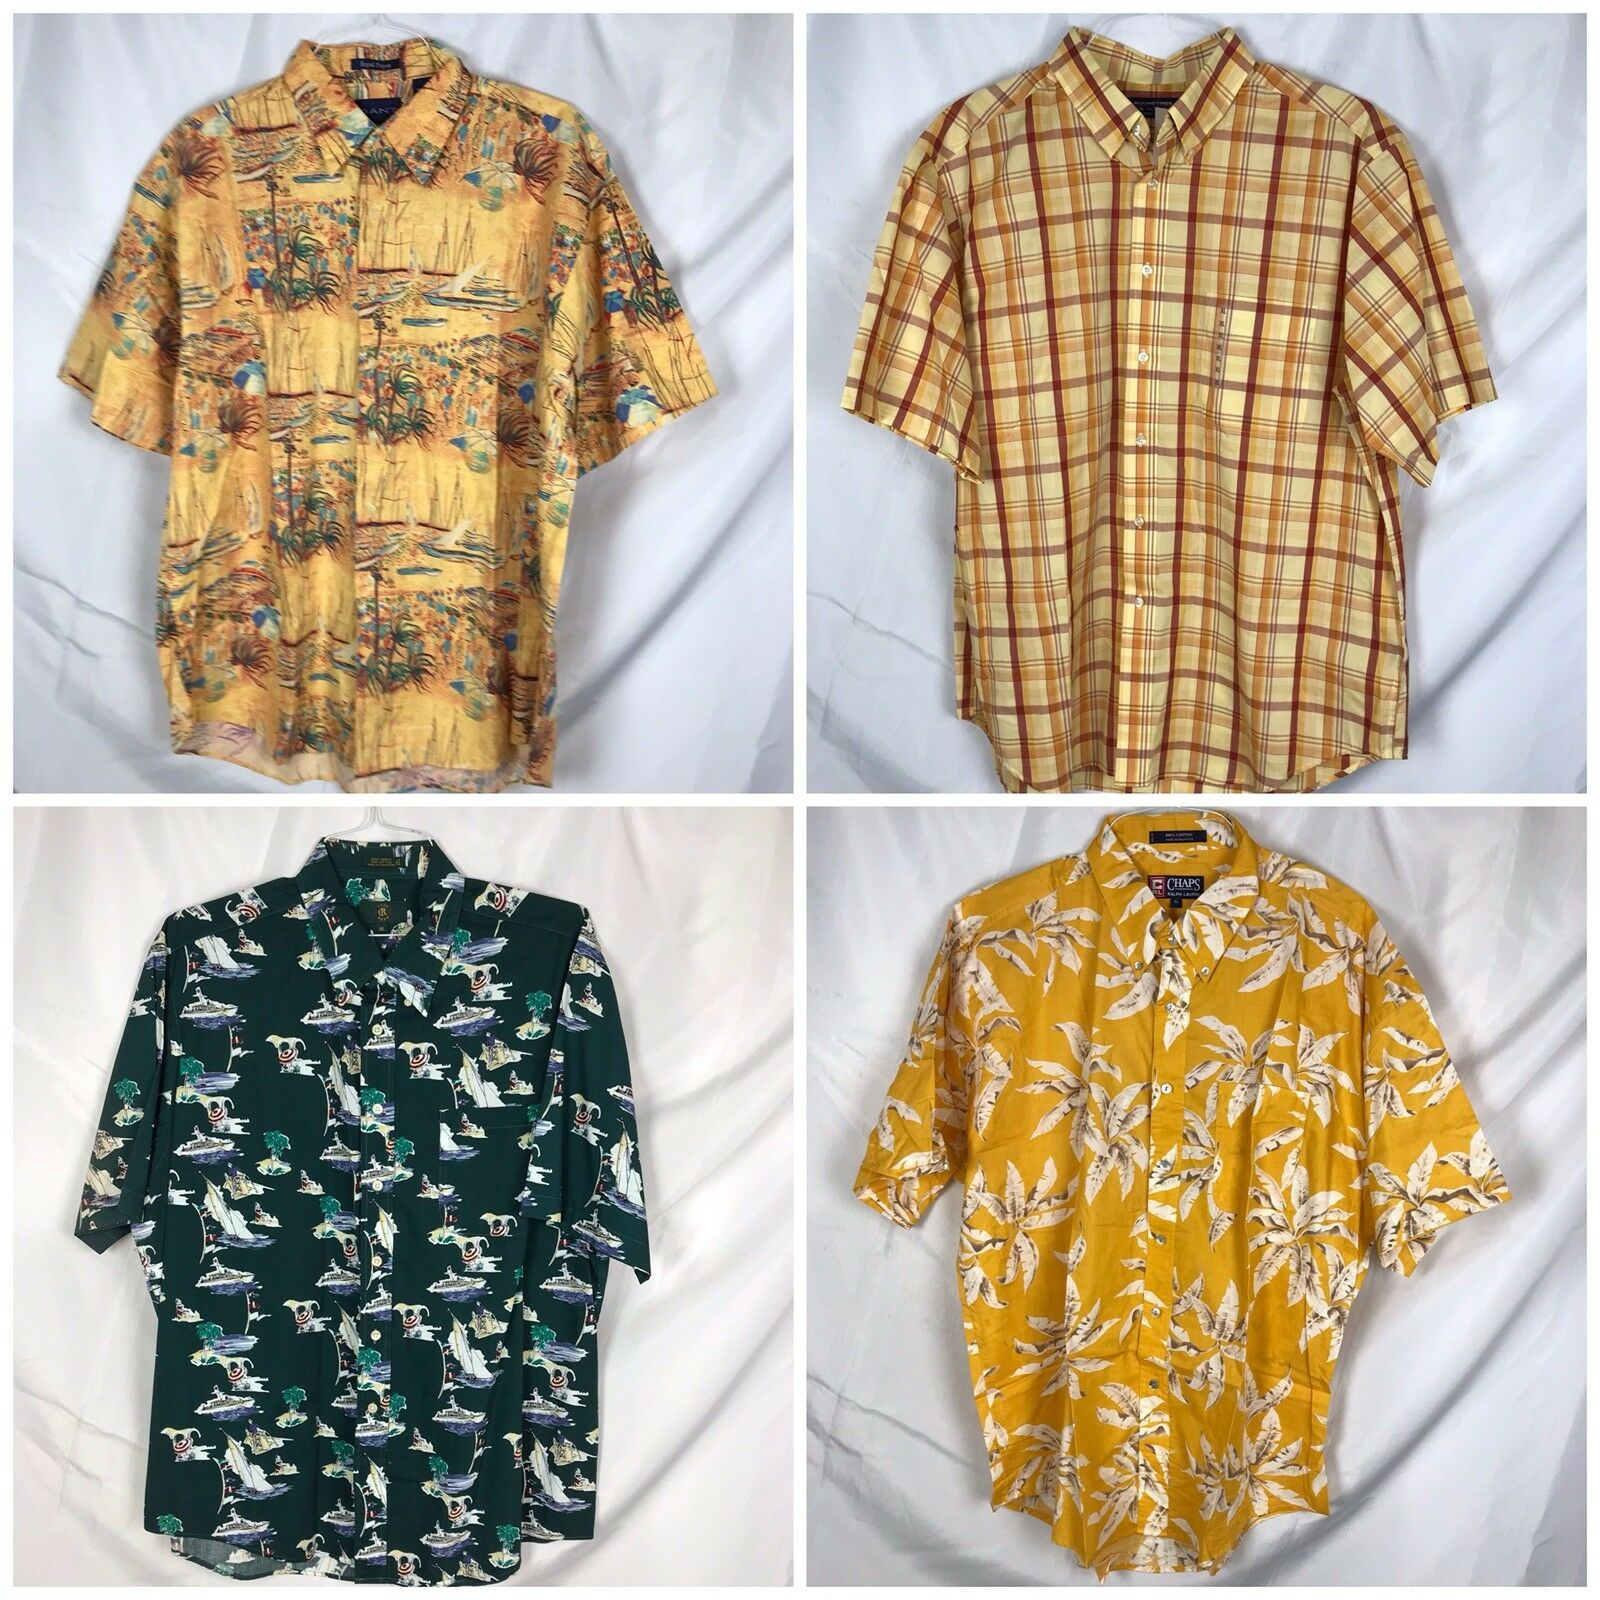 8b5863a7 Lot 4 Mens XL Short Sleeve Tropical Vacation Boats Shirts Chaps Club Room  Gant